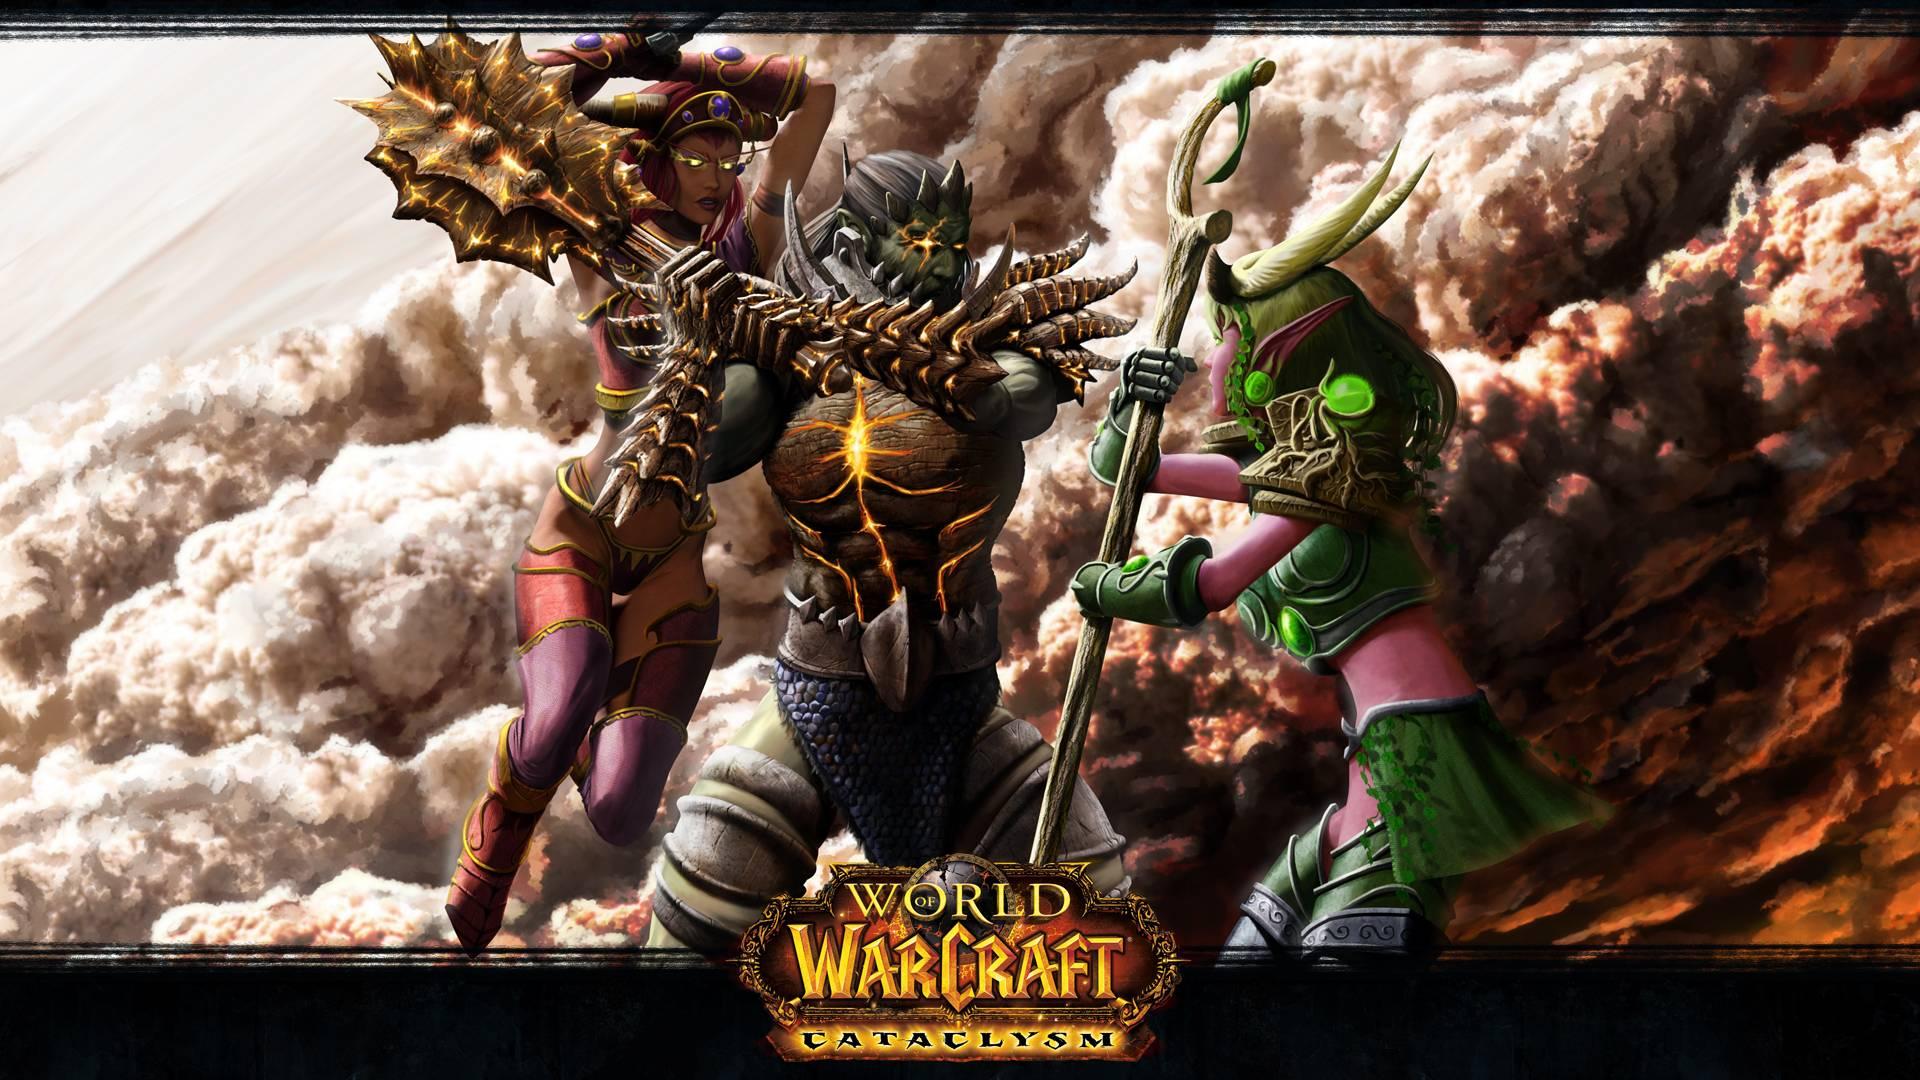 World Of Warcraft Wallpaper 1920x1080: WoW Cataclysm Wallpapers